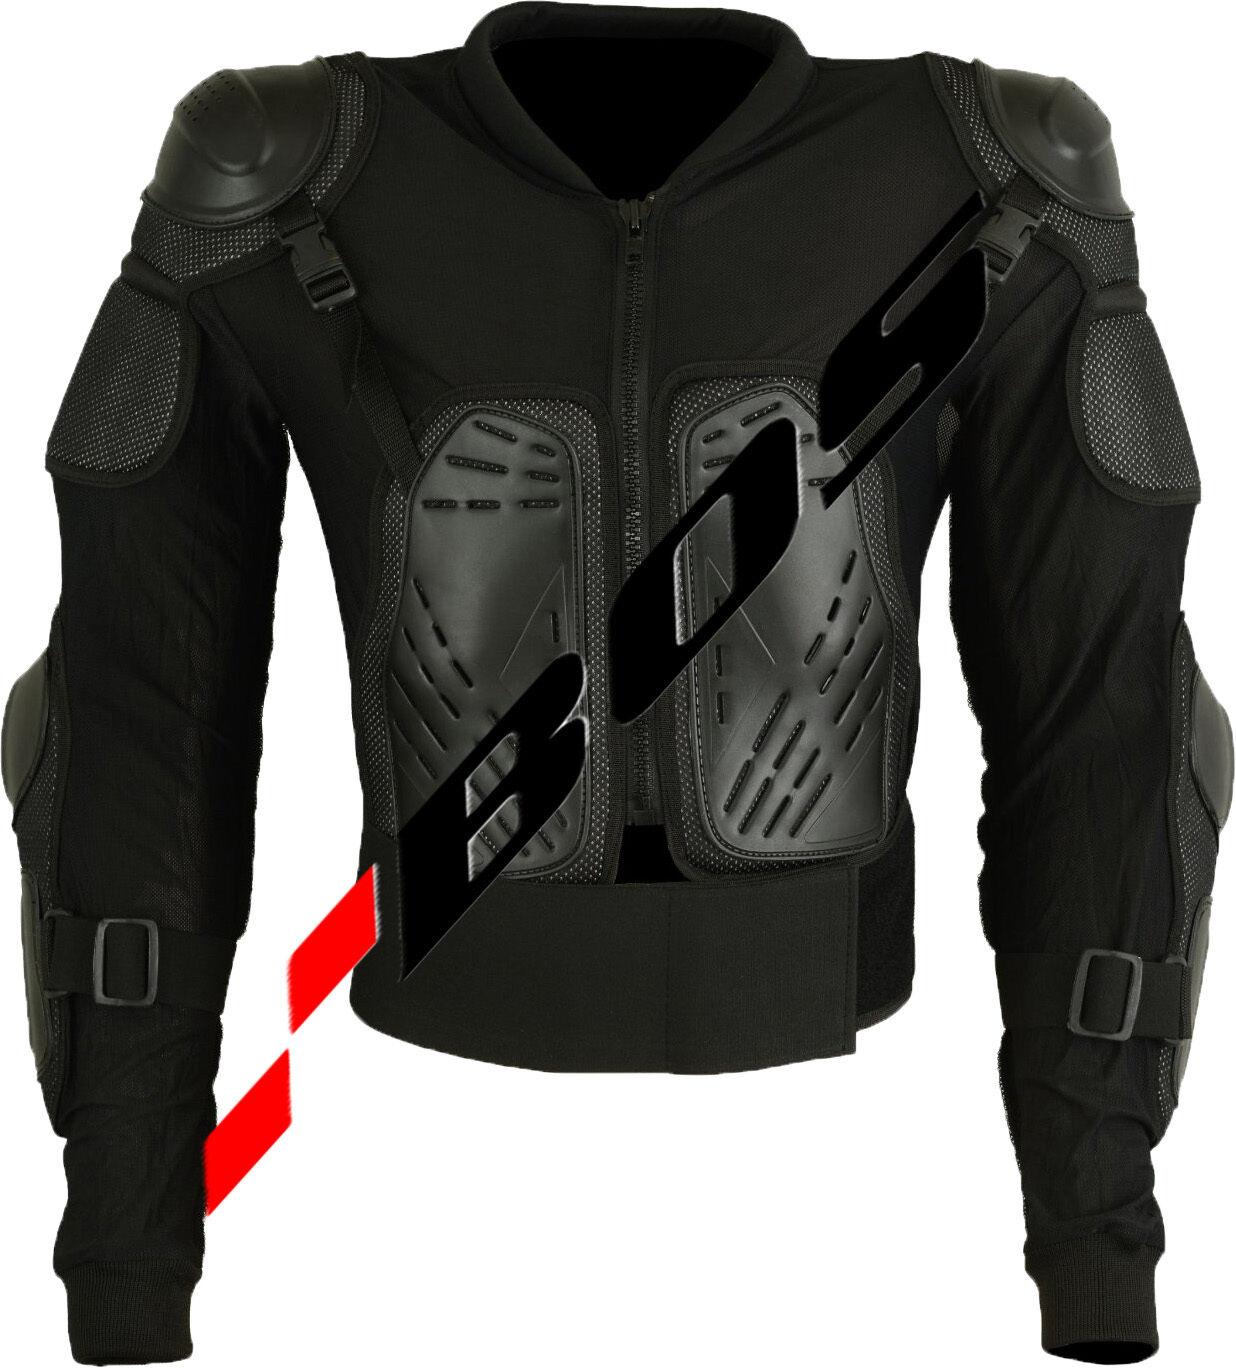 Giacca moto Giacca protezioni Giacca moto Armour BMX Safety PROTEZIONI Camicia gr-m-5xl e9e36f